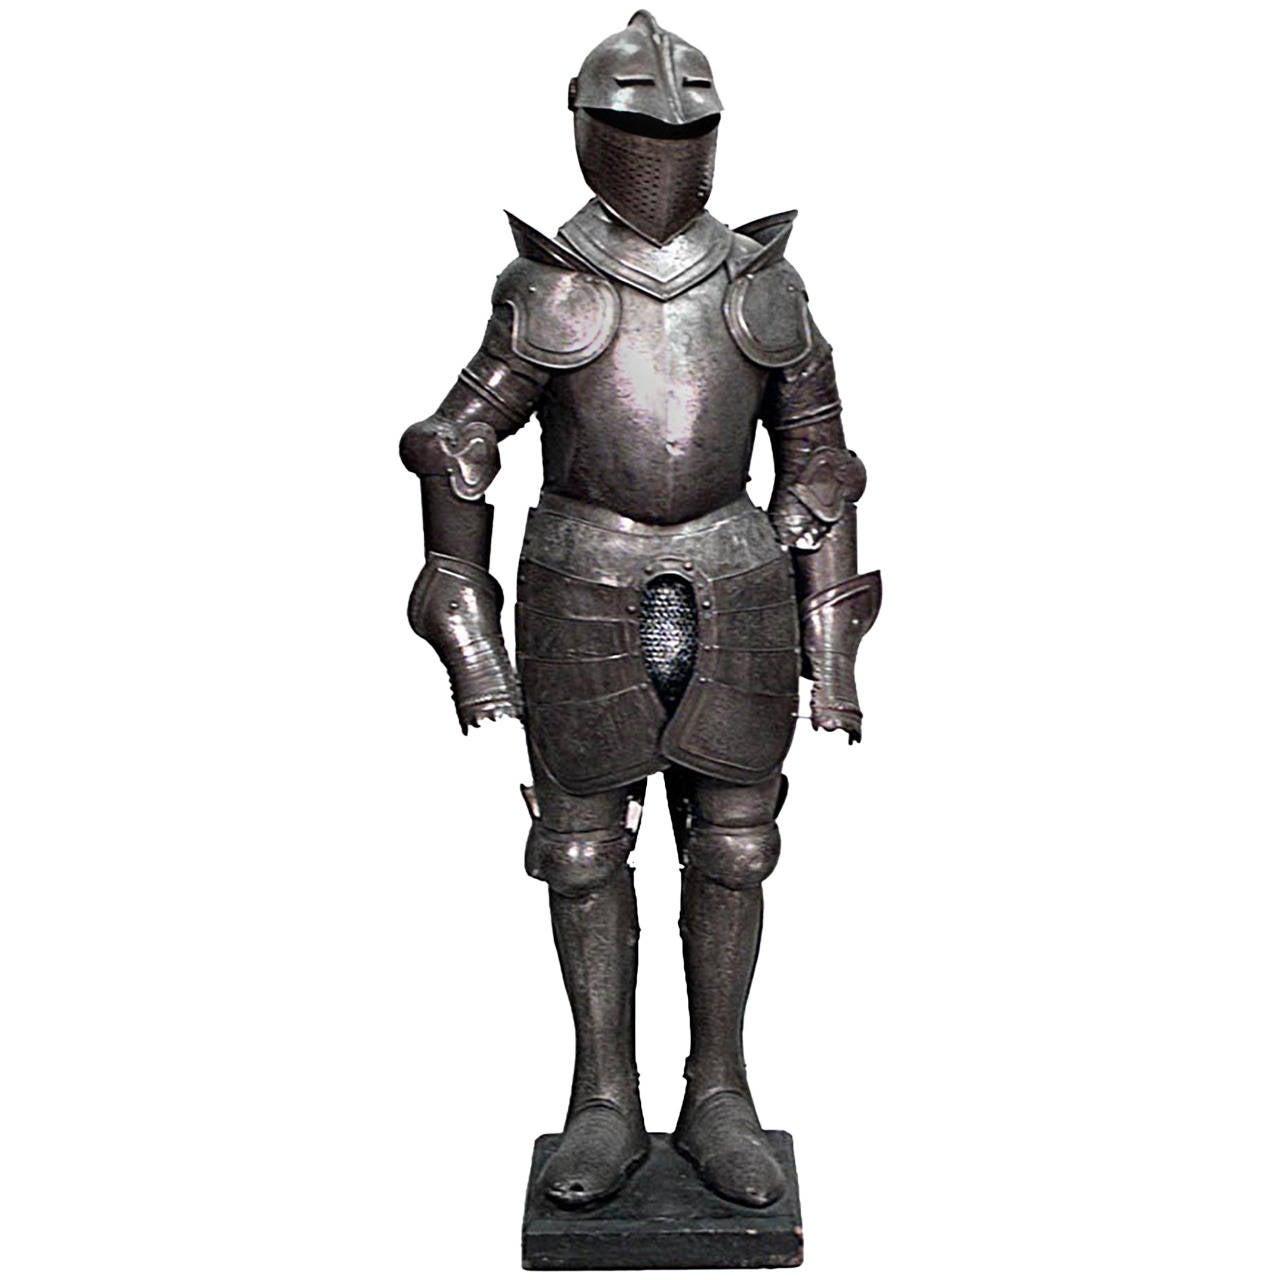 Short Italian Renaissance,Style Etched Metal Suit of Armor